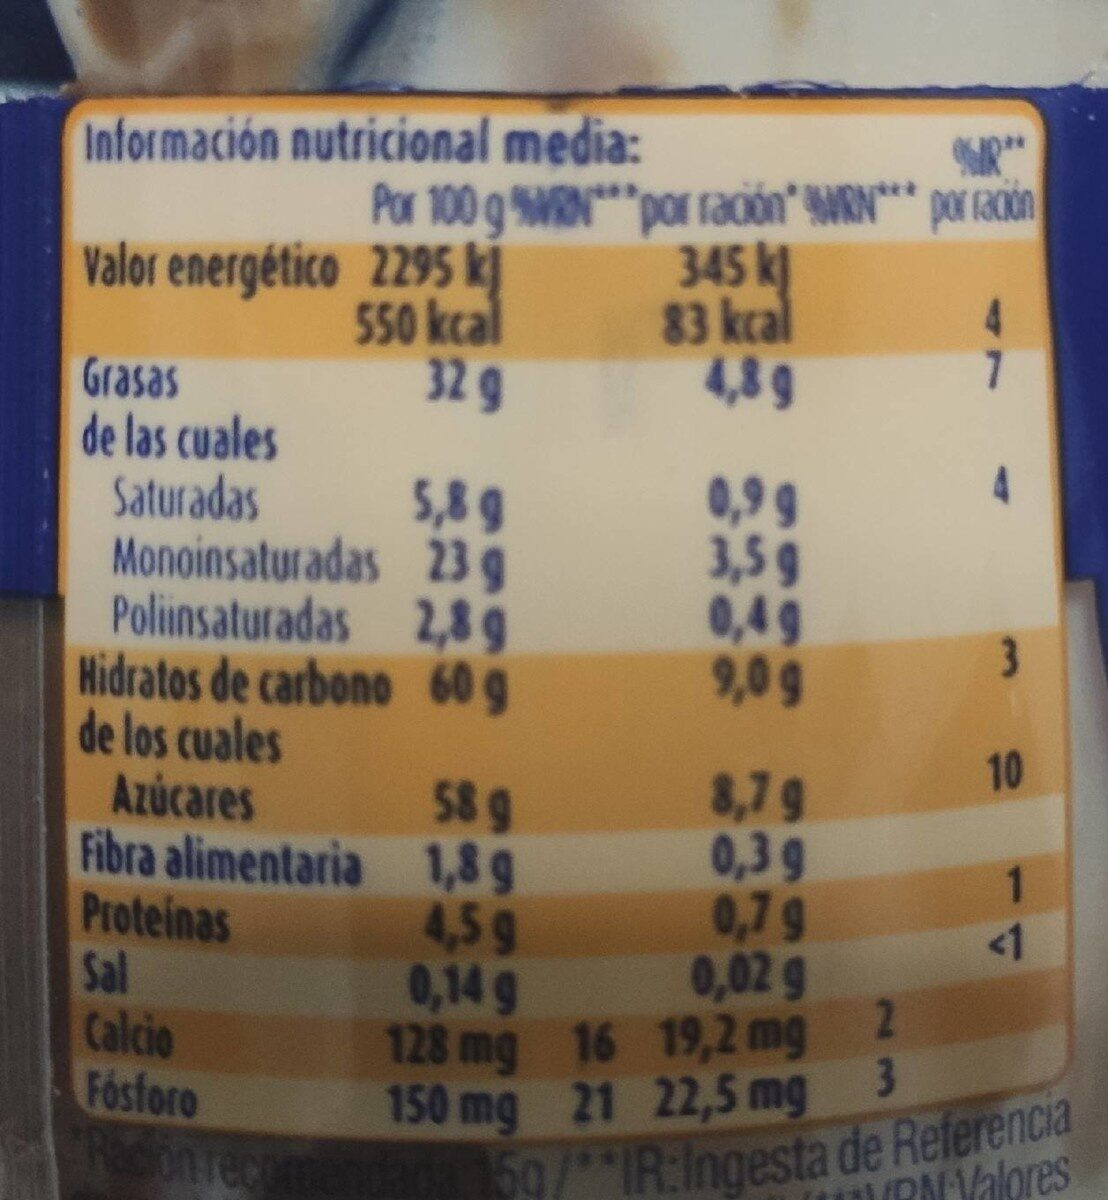 Pâte à tartiner - Informació nutricional - es